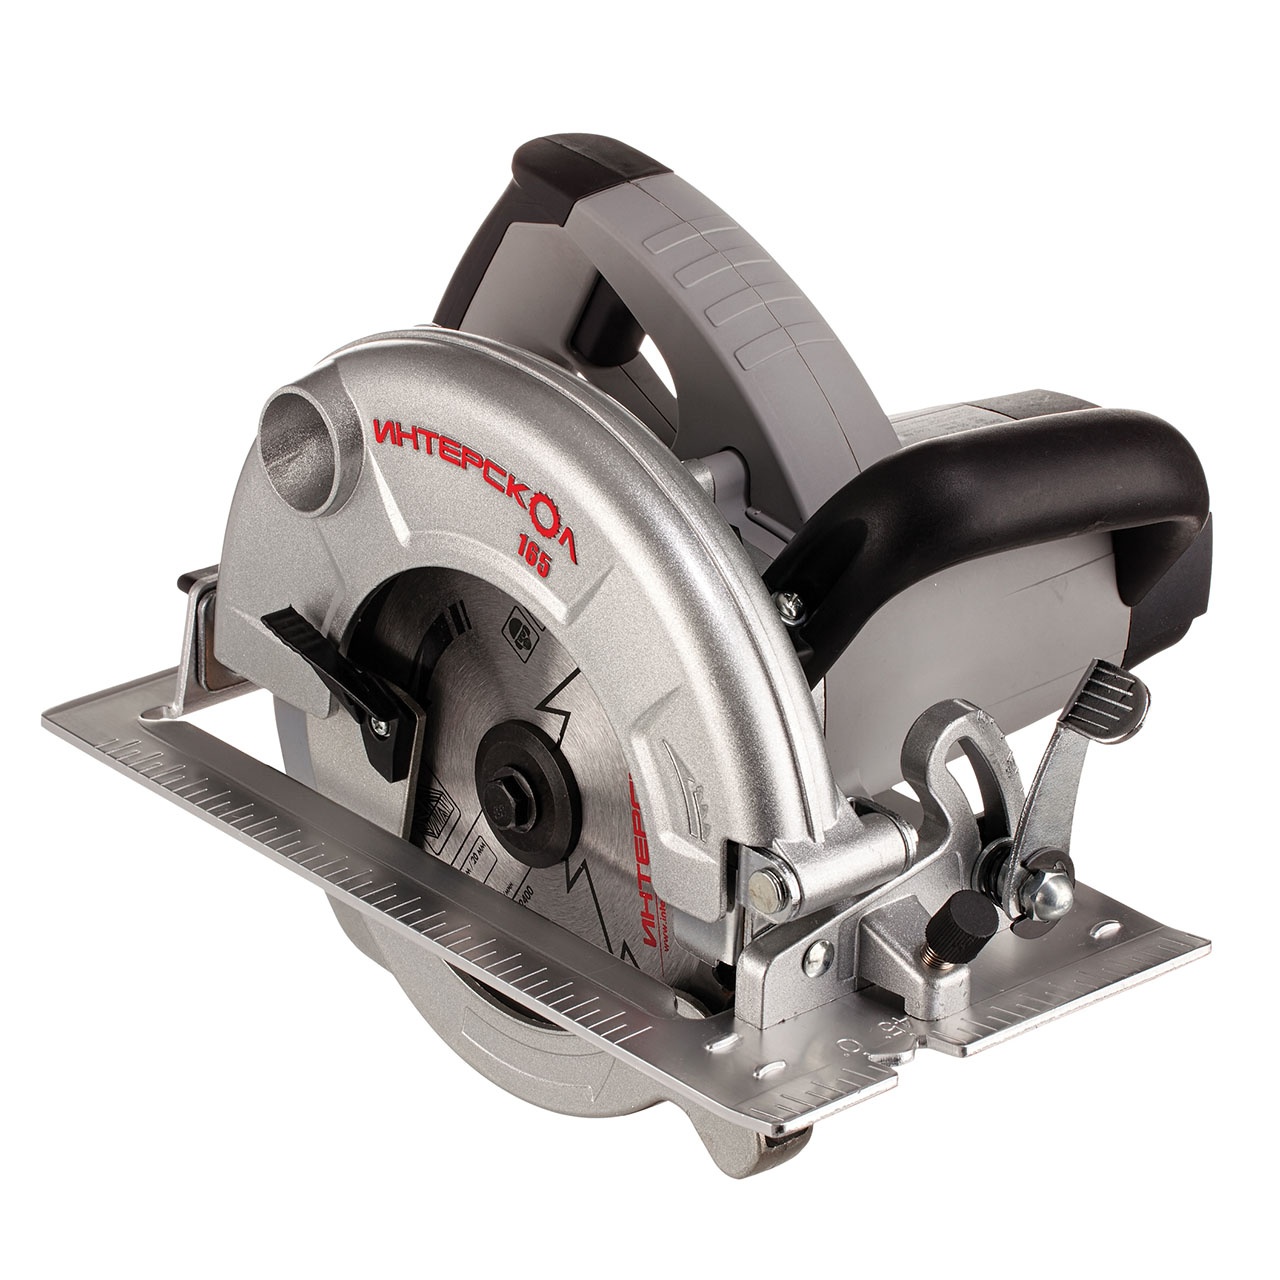 Circular saw Interskol DP-165/1200 цена